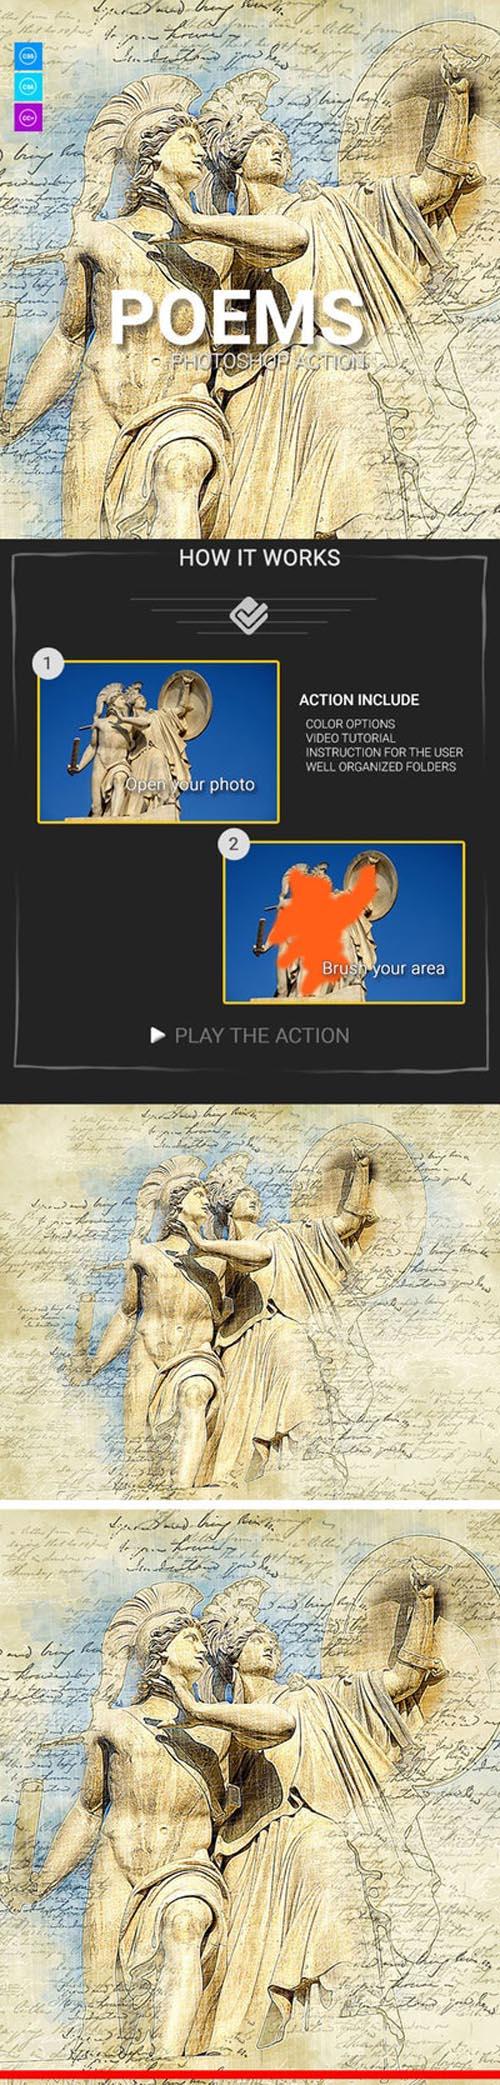 Poems Photoshop Action 21122966